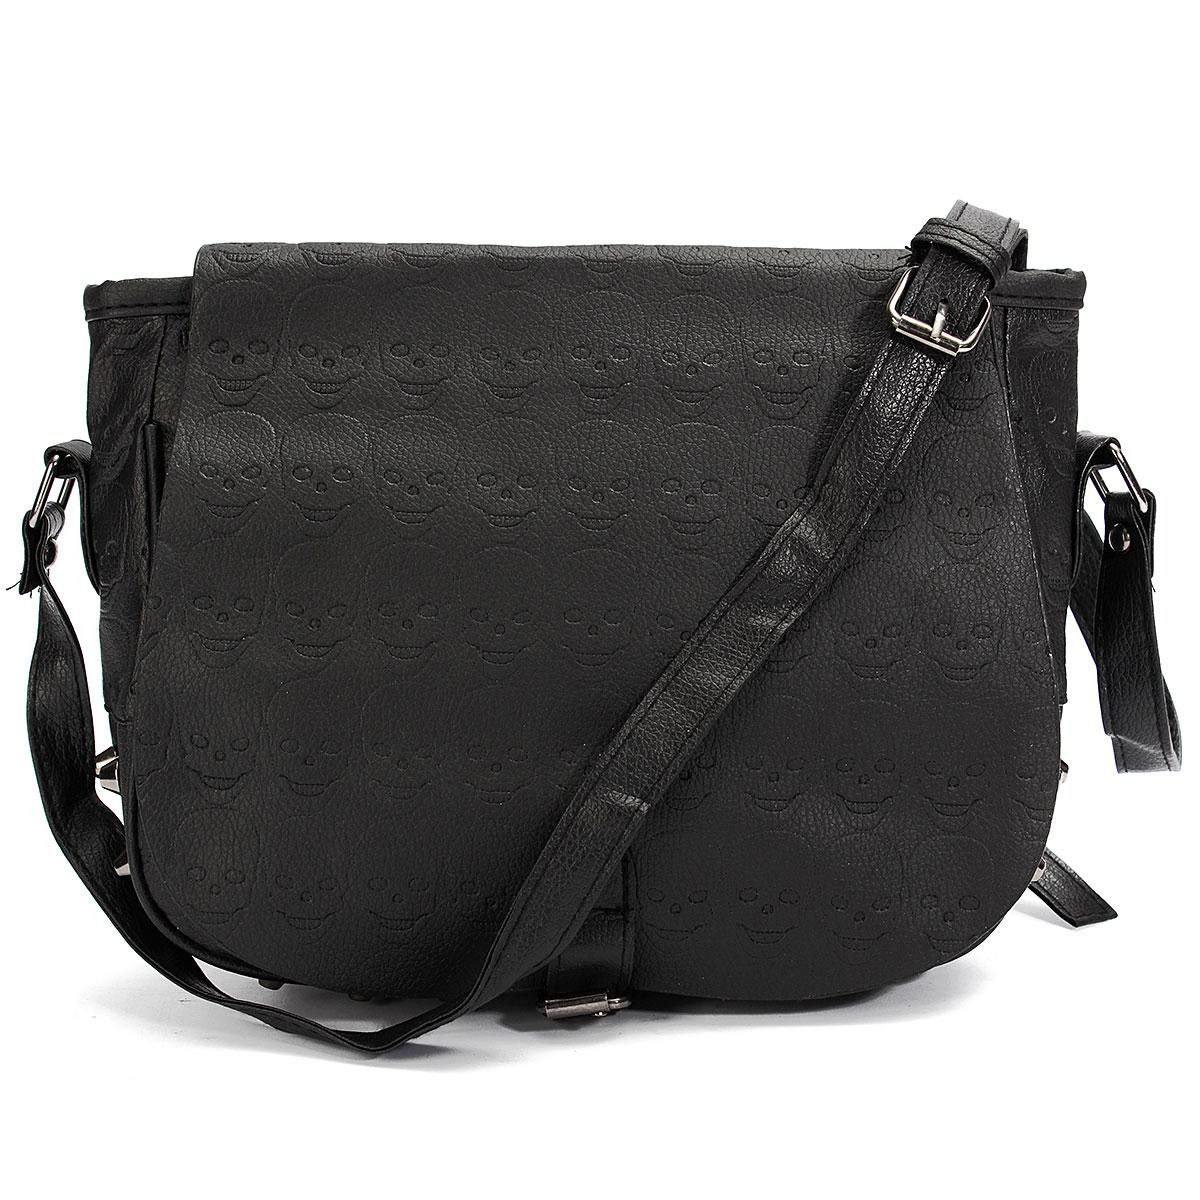 Black Women Shoulder Crossbody Bags Skull Leather Lady Handbags Retro  Vintage Style Girls Small Messenger Sling Bag Rivet Bolsa  Happy4Sales   kids  bagshop ... 49f9ceb8e8b9a